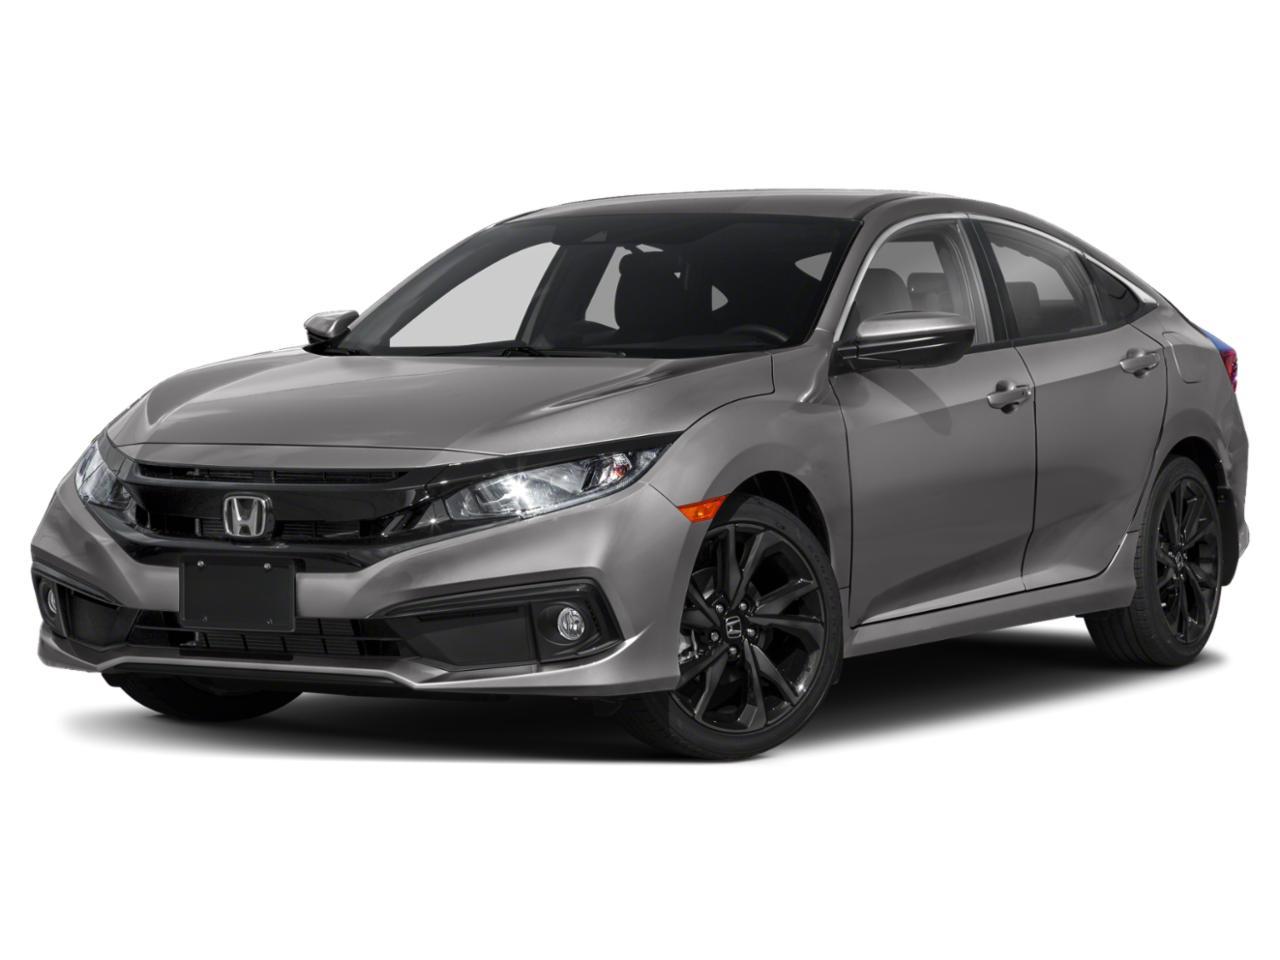 2019 Honda Civic Hatchback Vehicle Photo in Plainfield, IL 60586